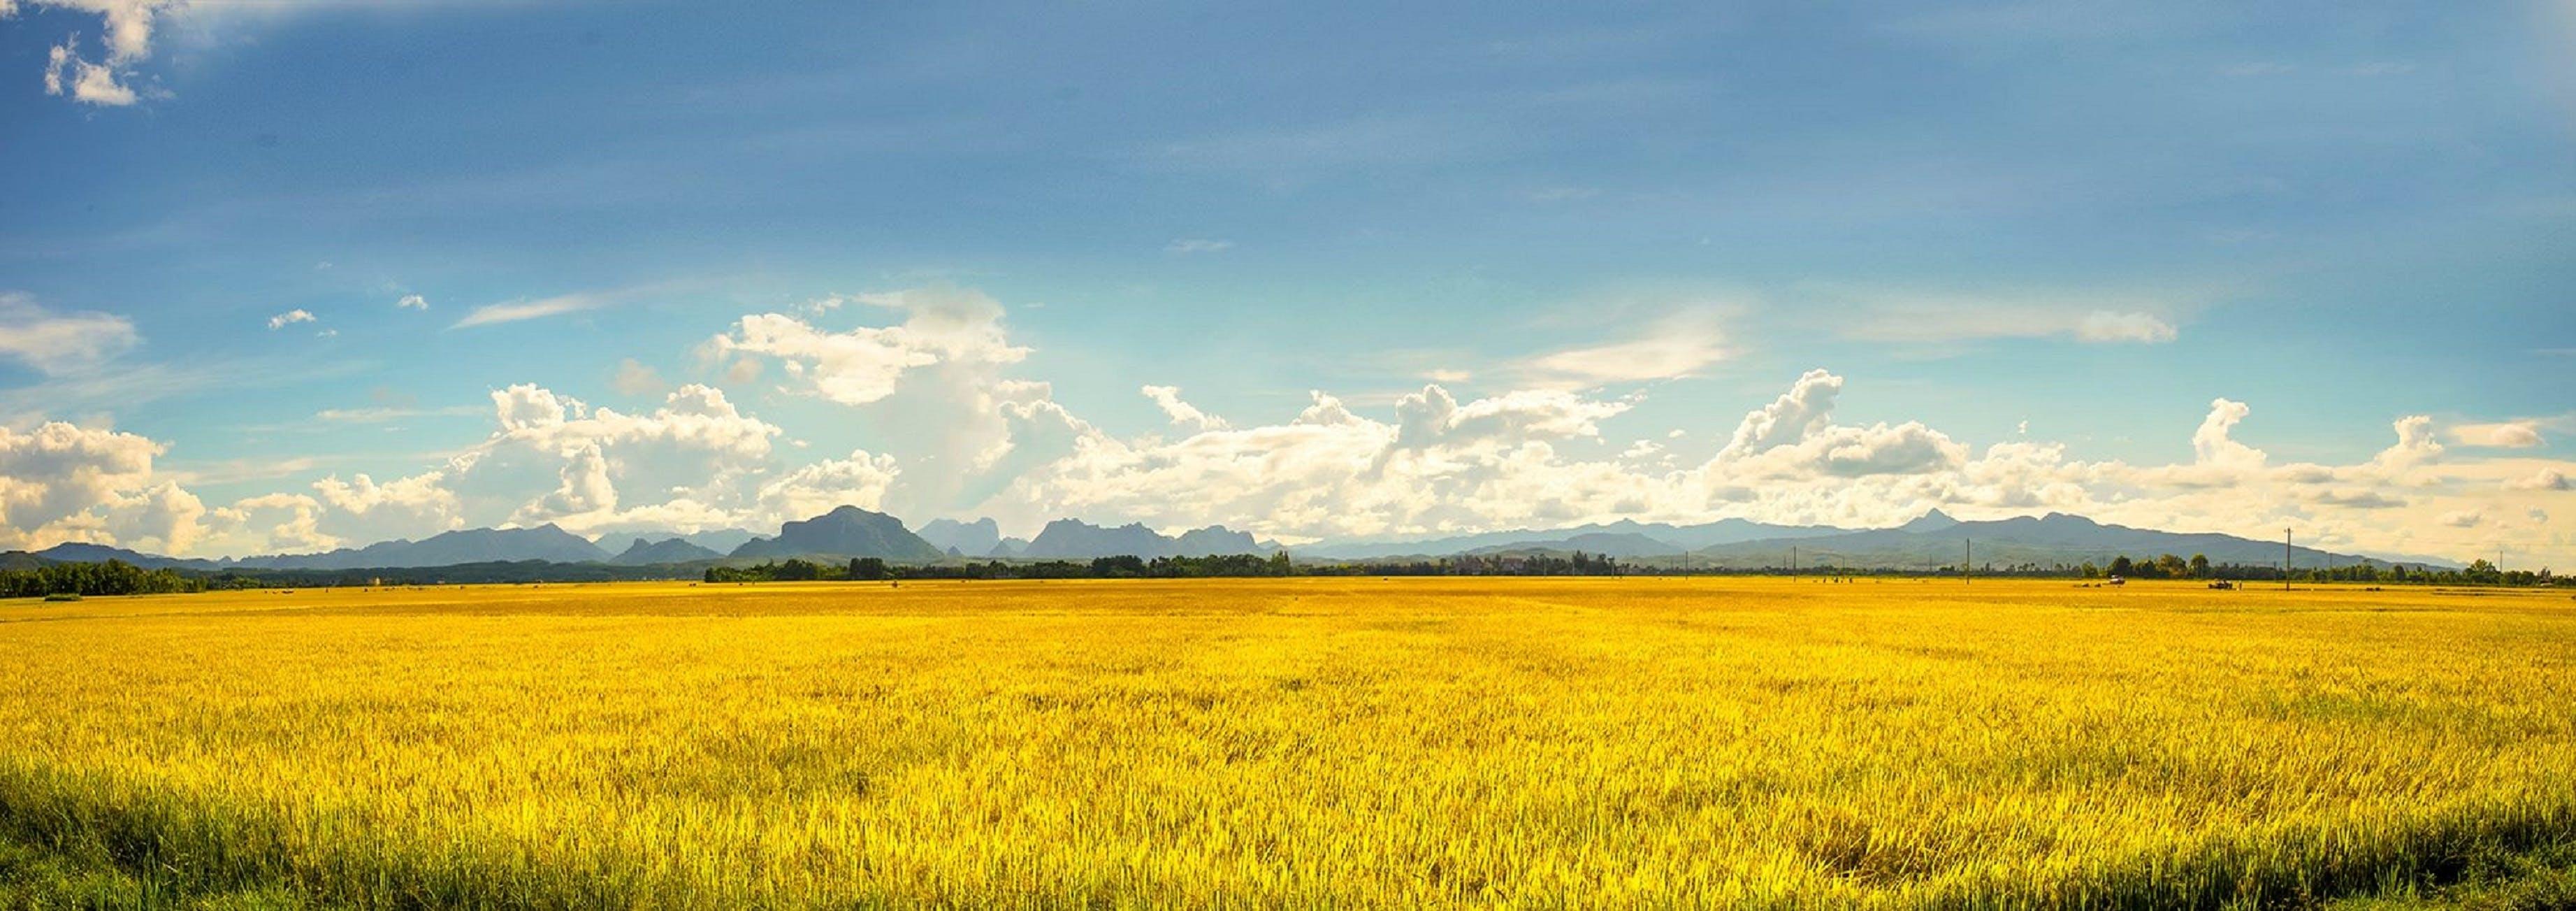 Free stock photo of bio, crop, farm, farming